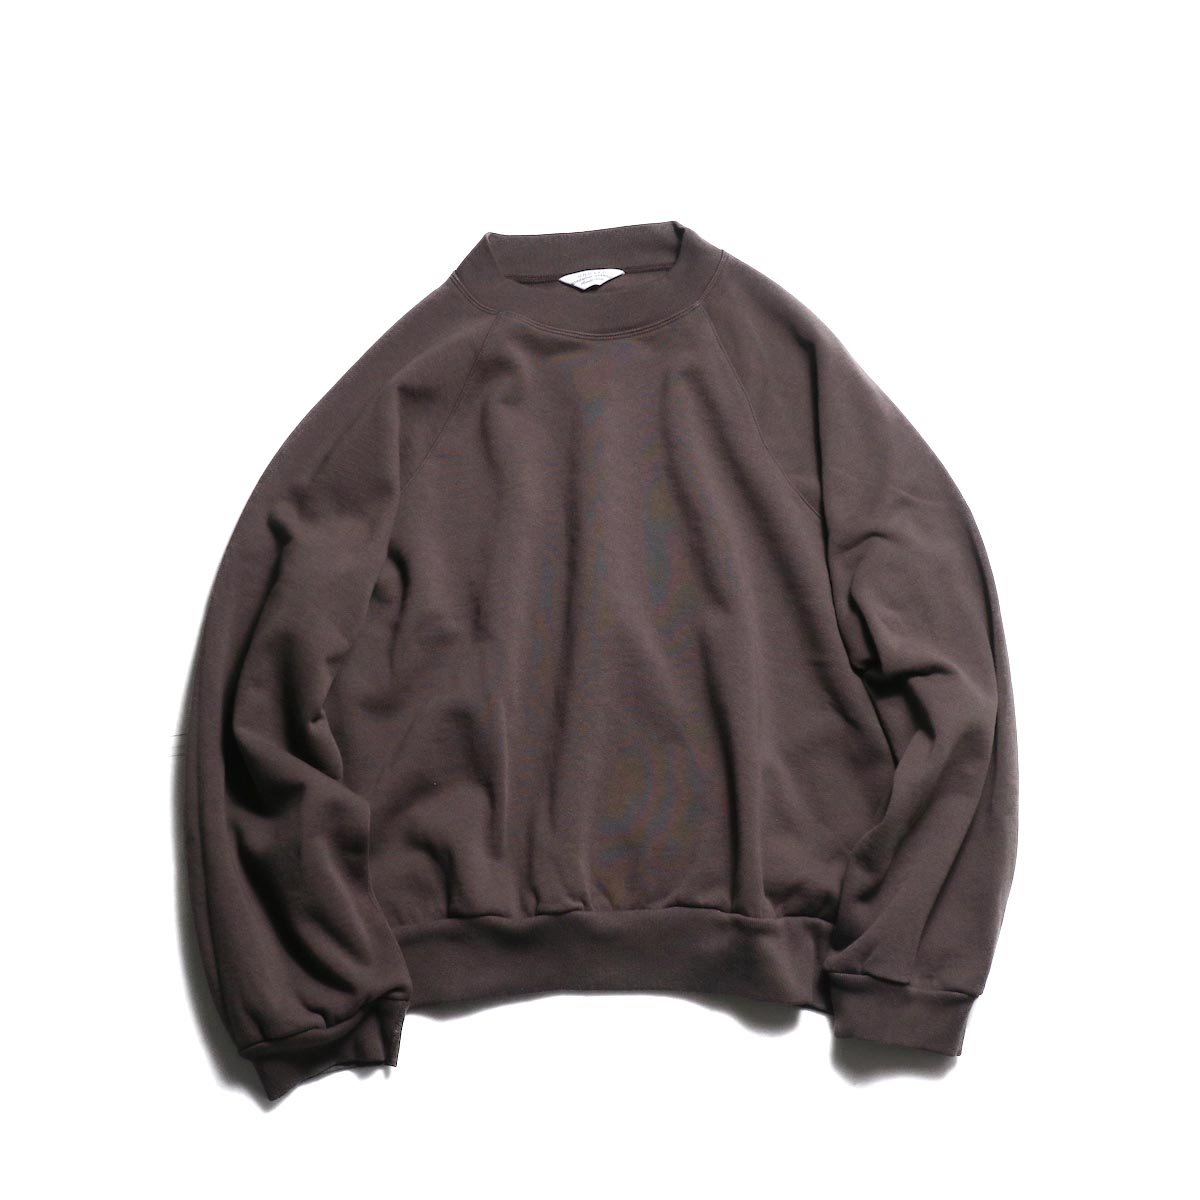 UNUSED / US1678 crew neck sweat shirt. -Brown